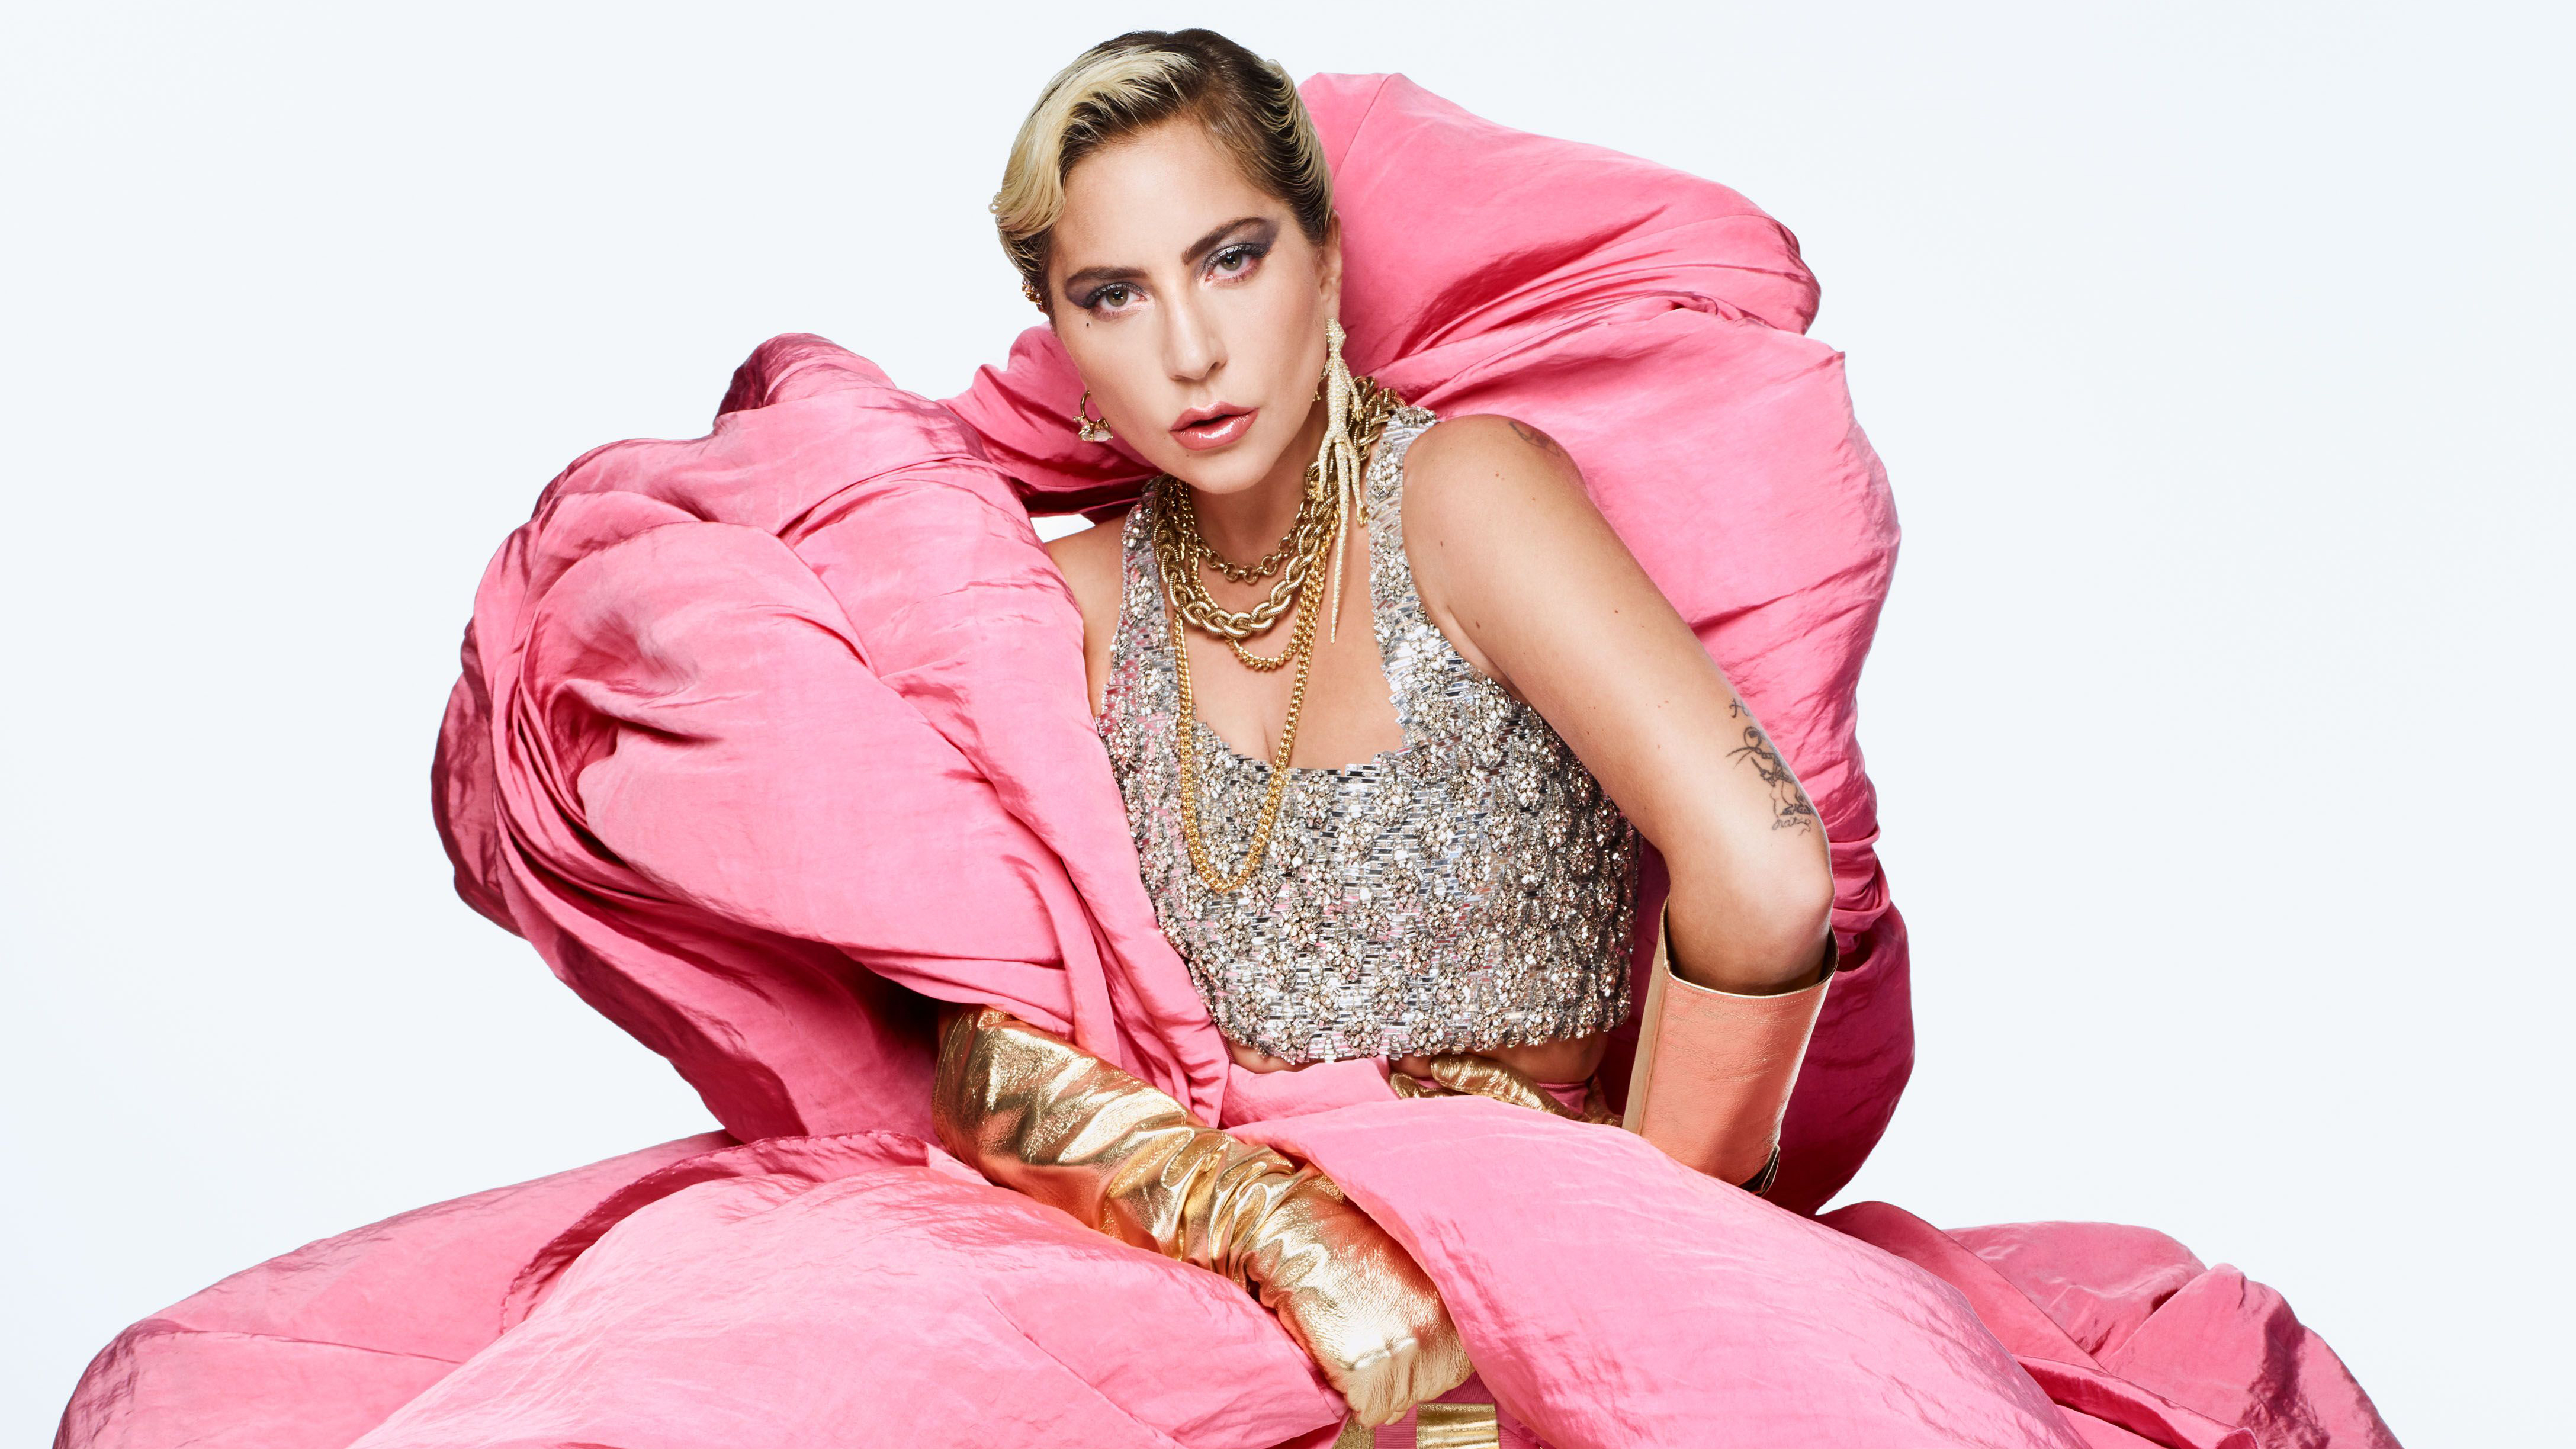 American Blonde Lady Gaga Singer 4350x2447